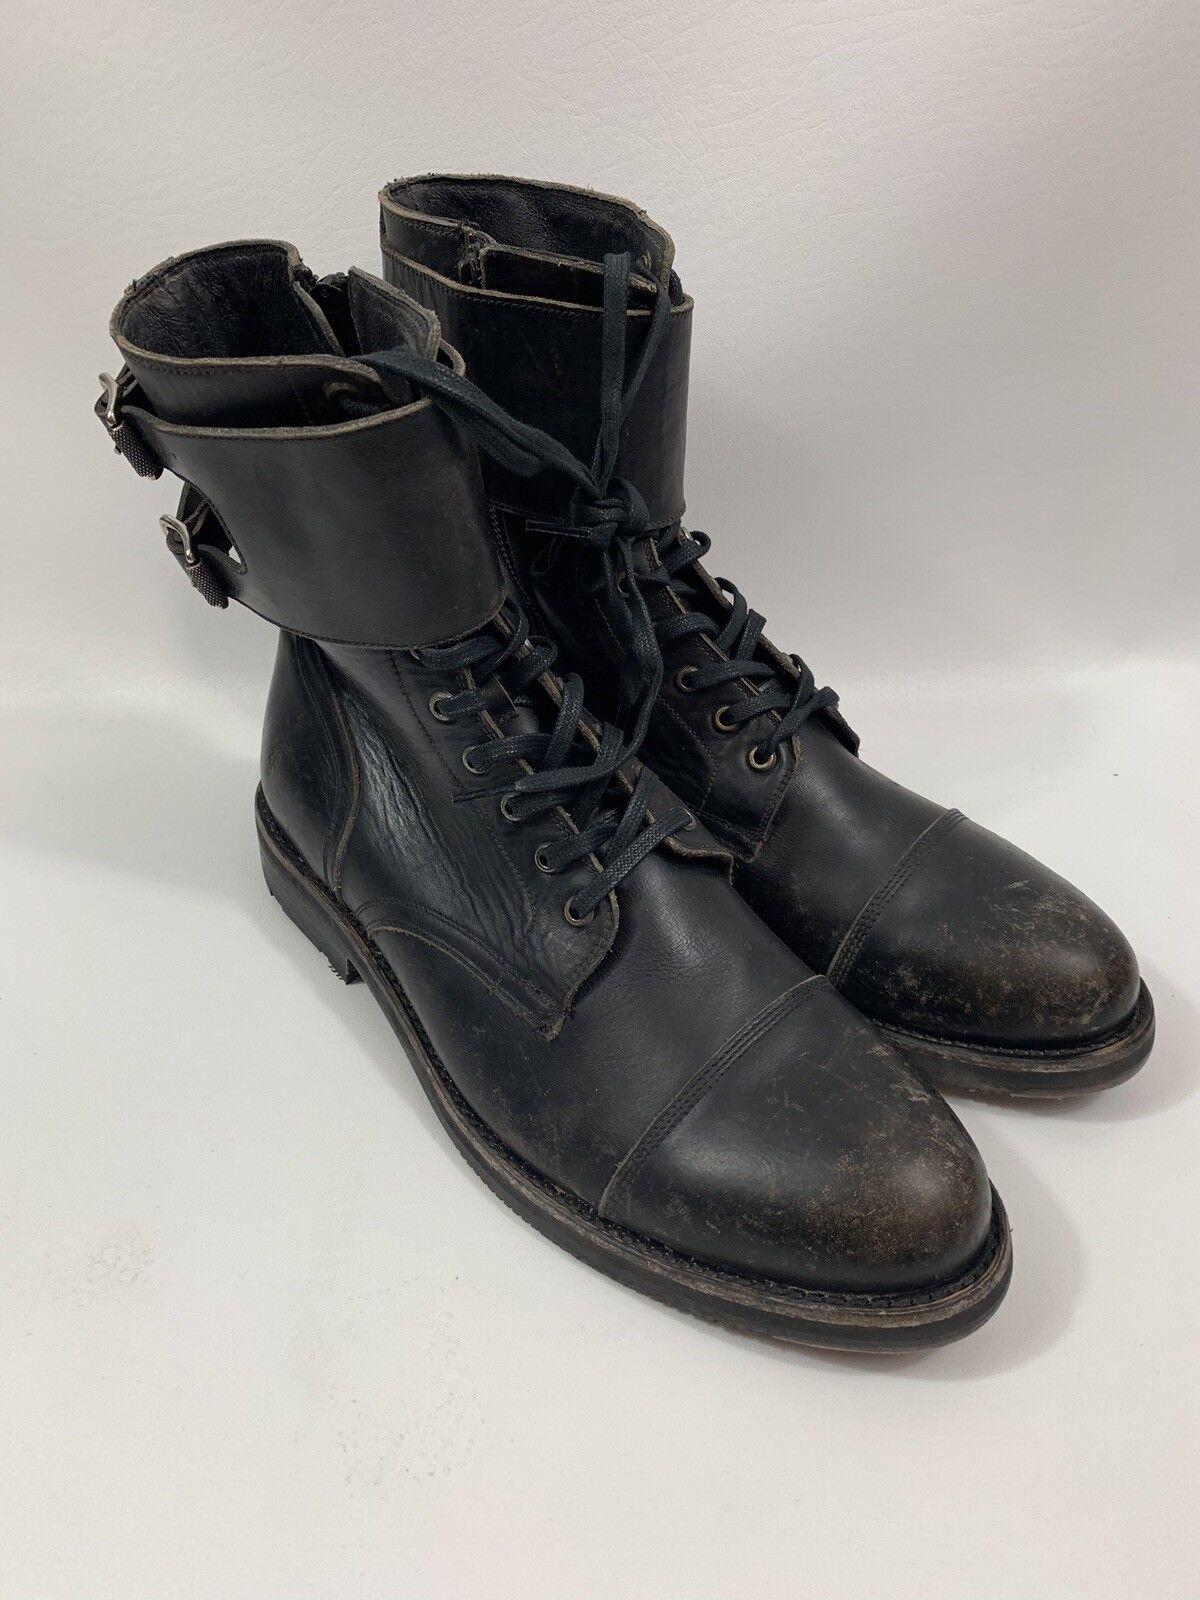 FRYE Military Combat botas Talla 11.5 D